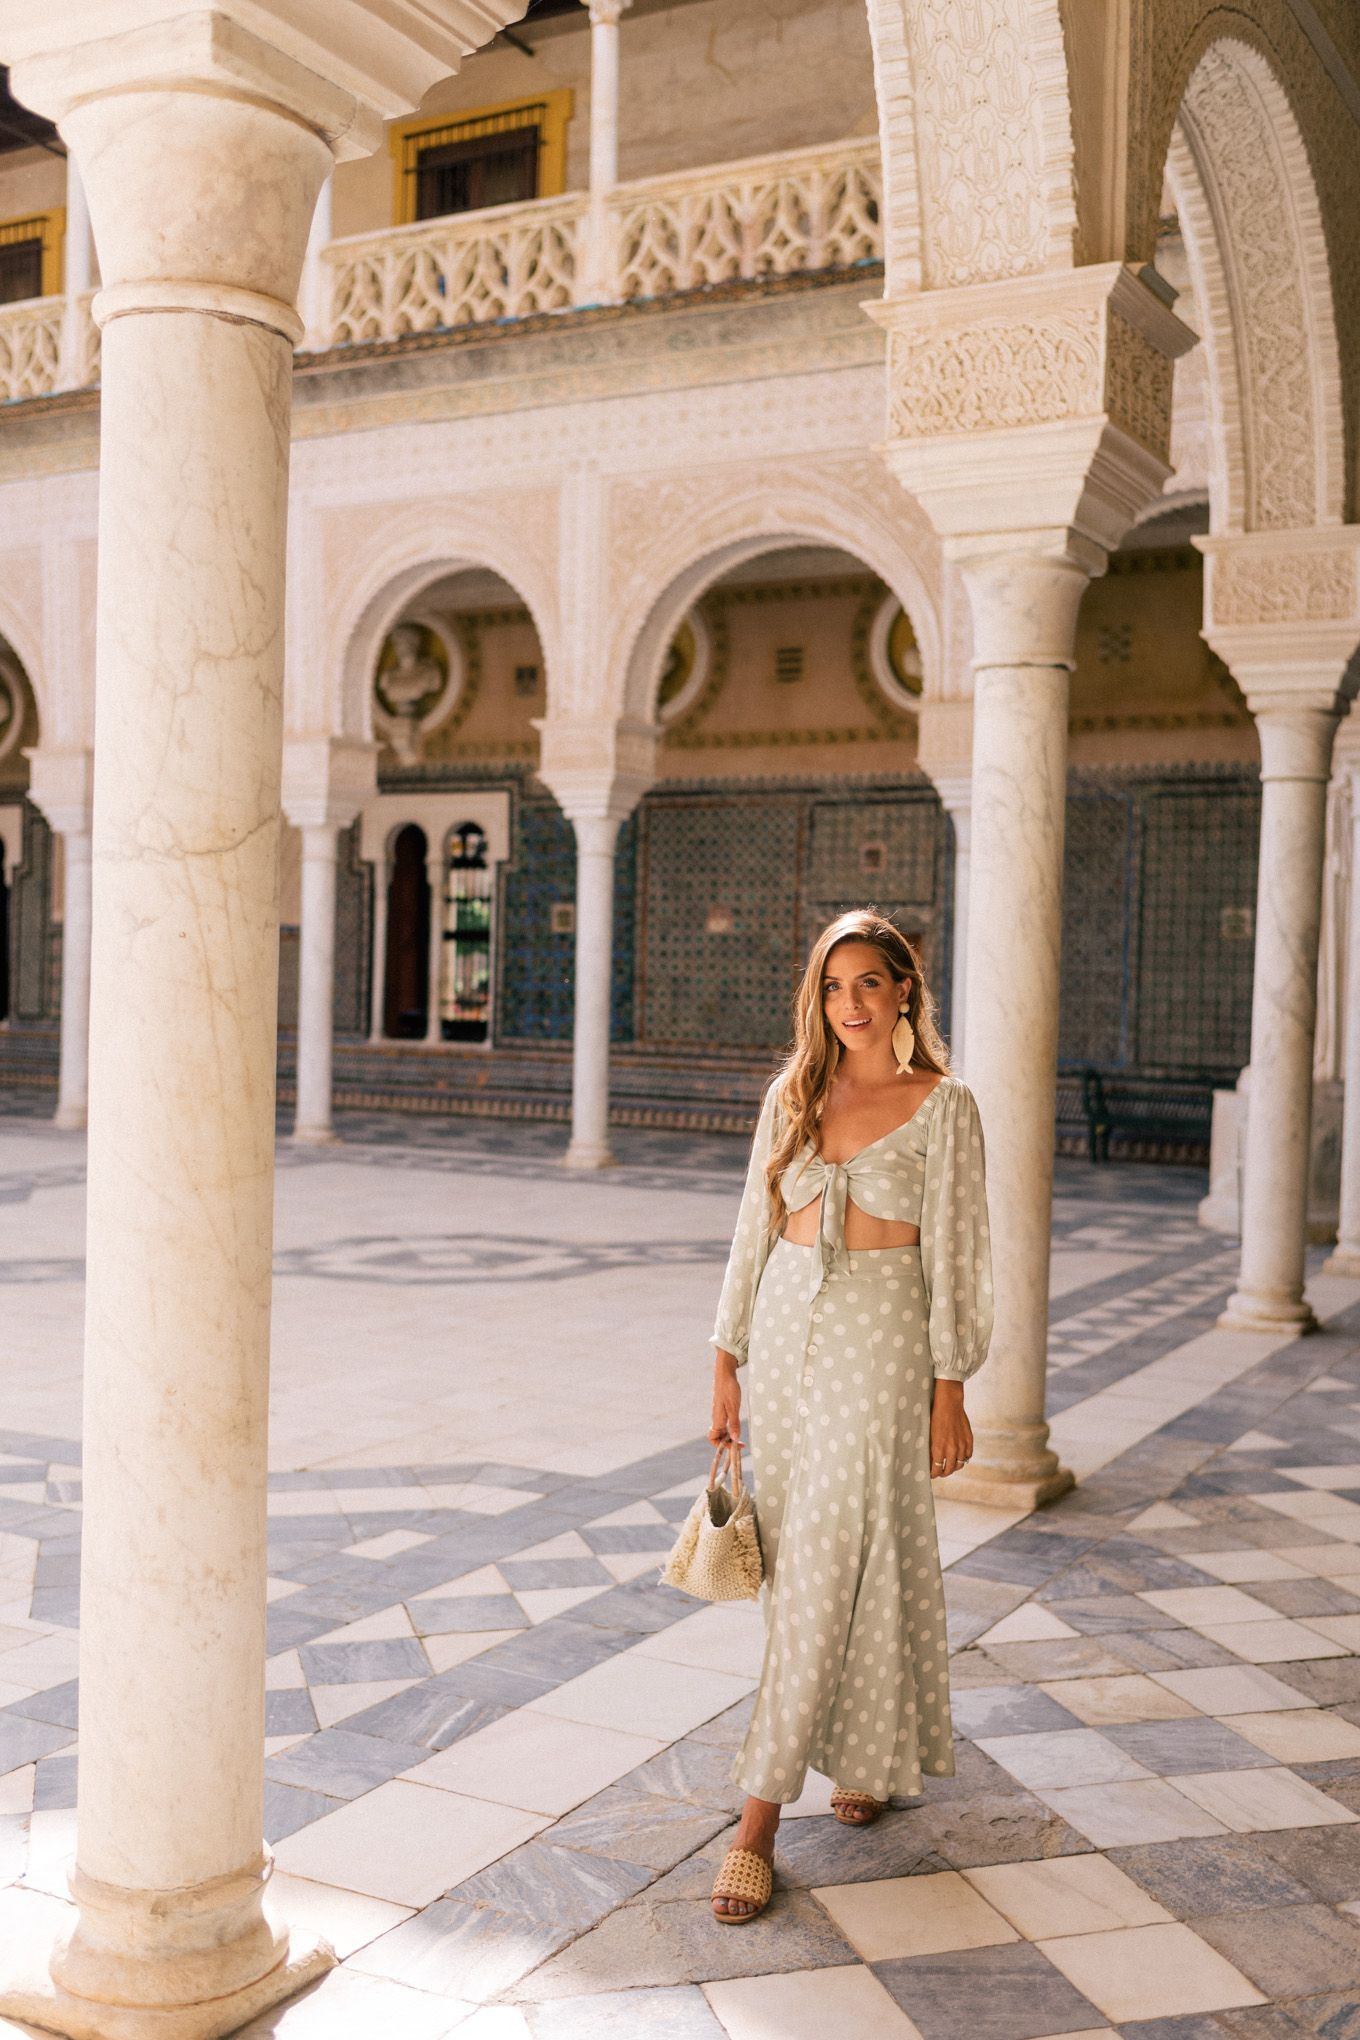 Seville Fashion: Beautiful Tiles In Seville & Visiting Casa De Pilatos